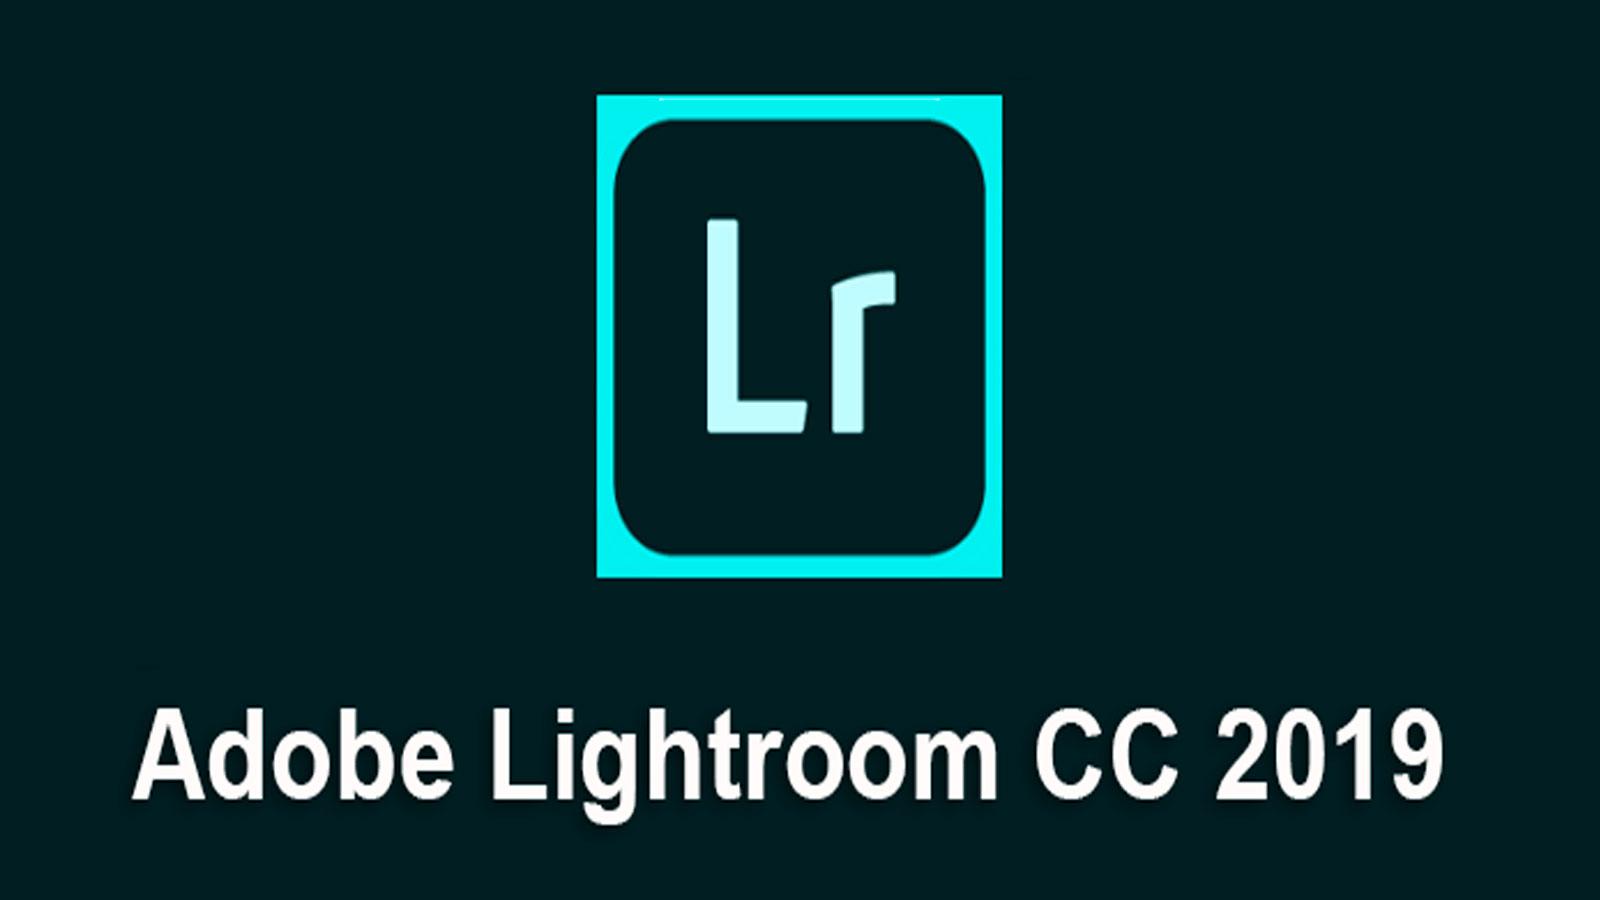 Lightroom cc 2019